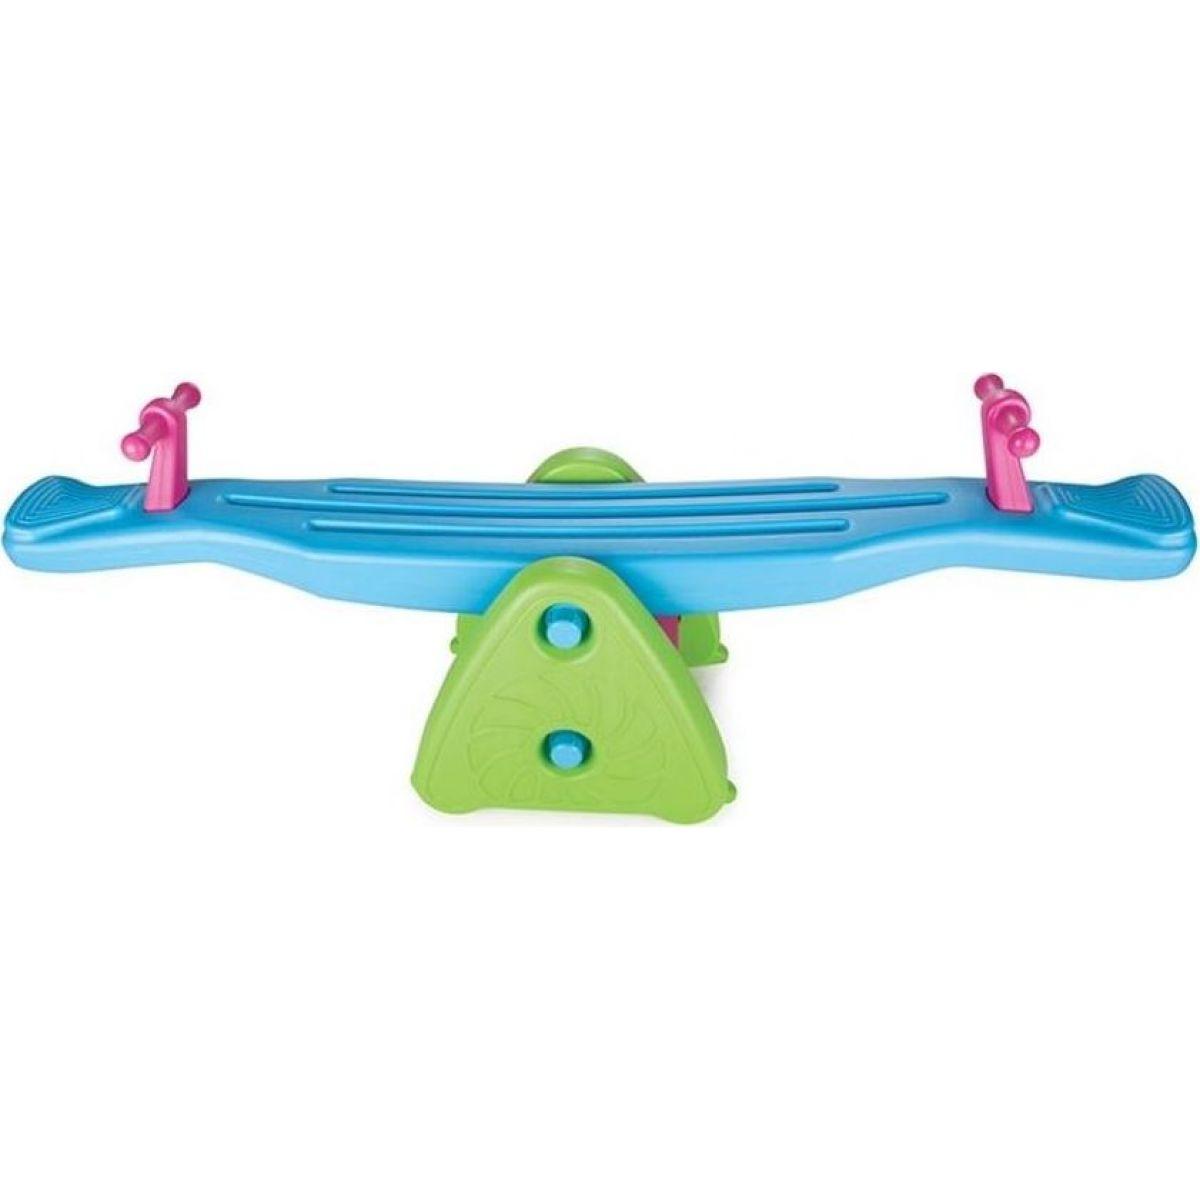 Pilsan Toys detská hojdačka Funny